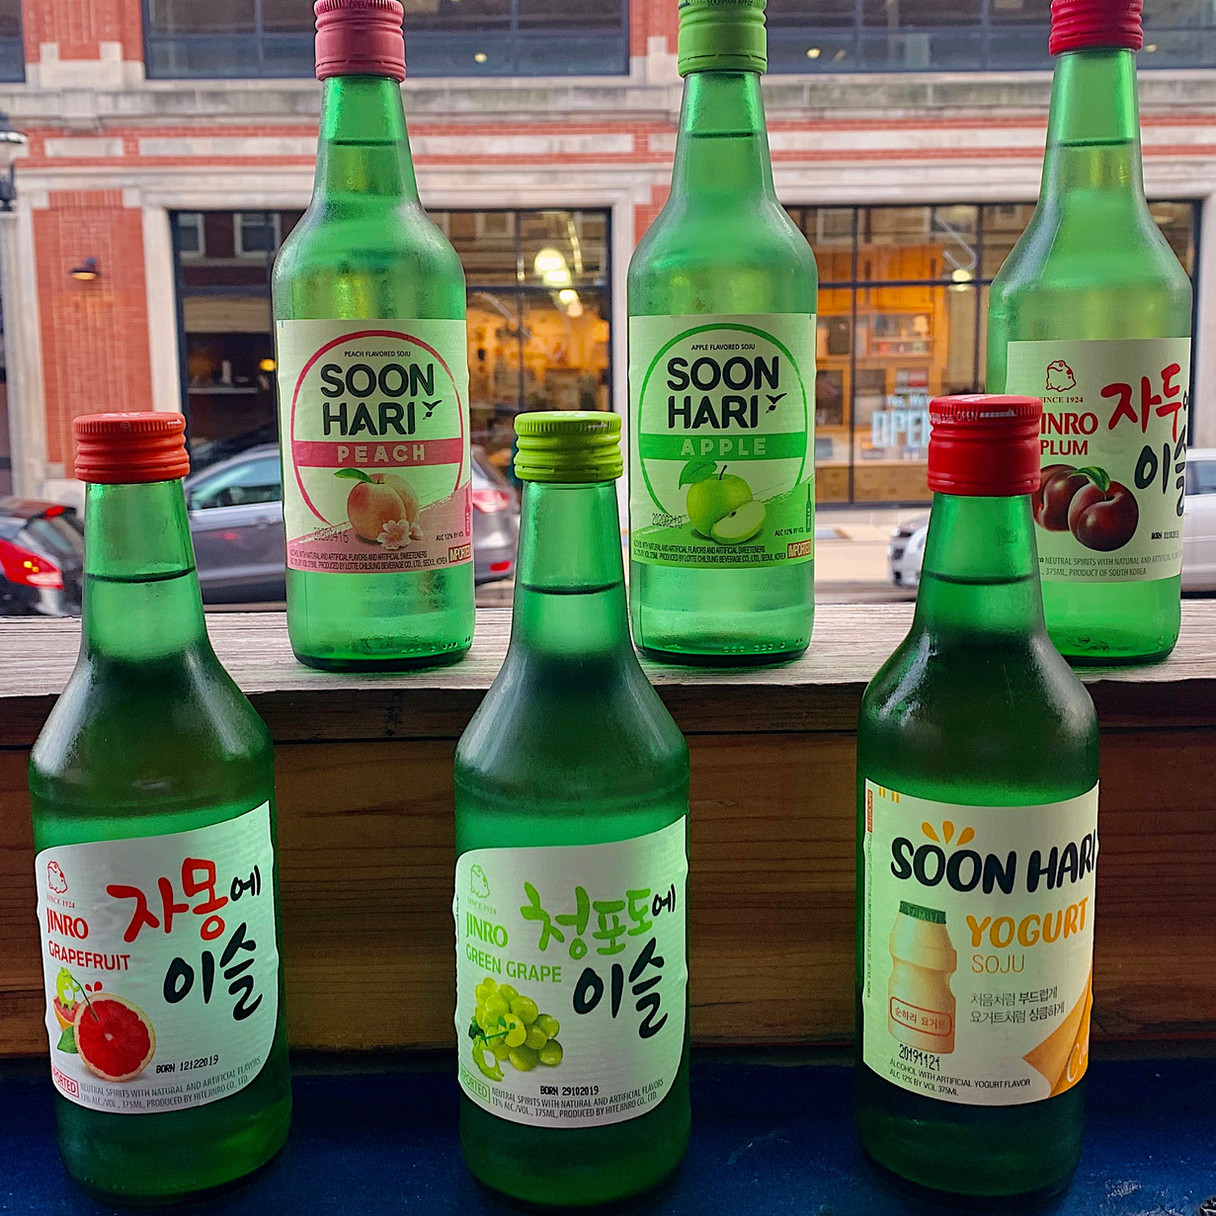 Flavored Soju